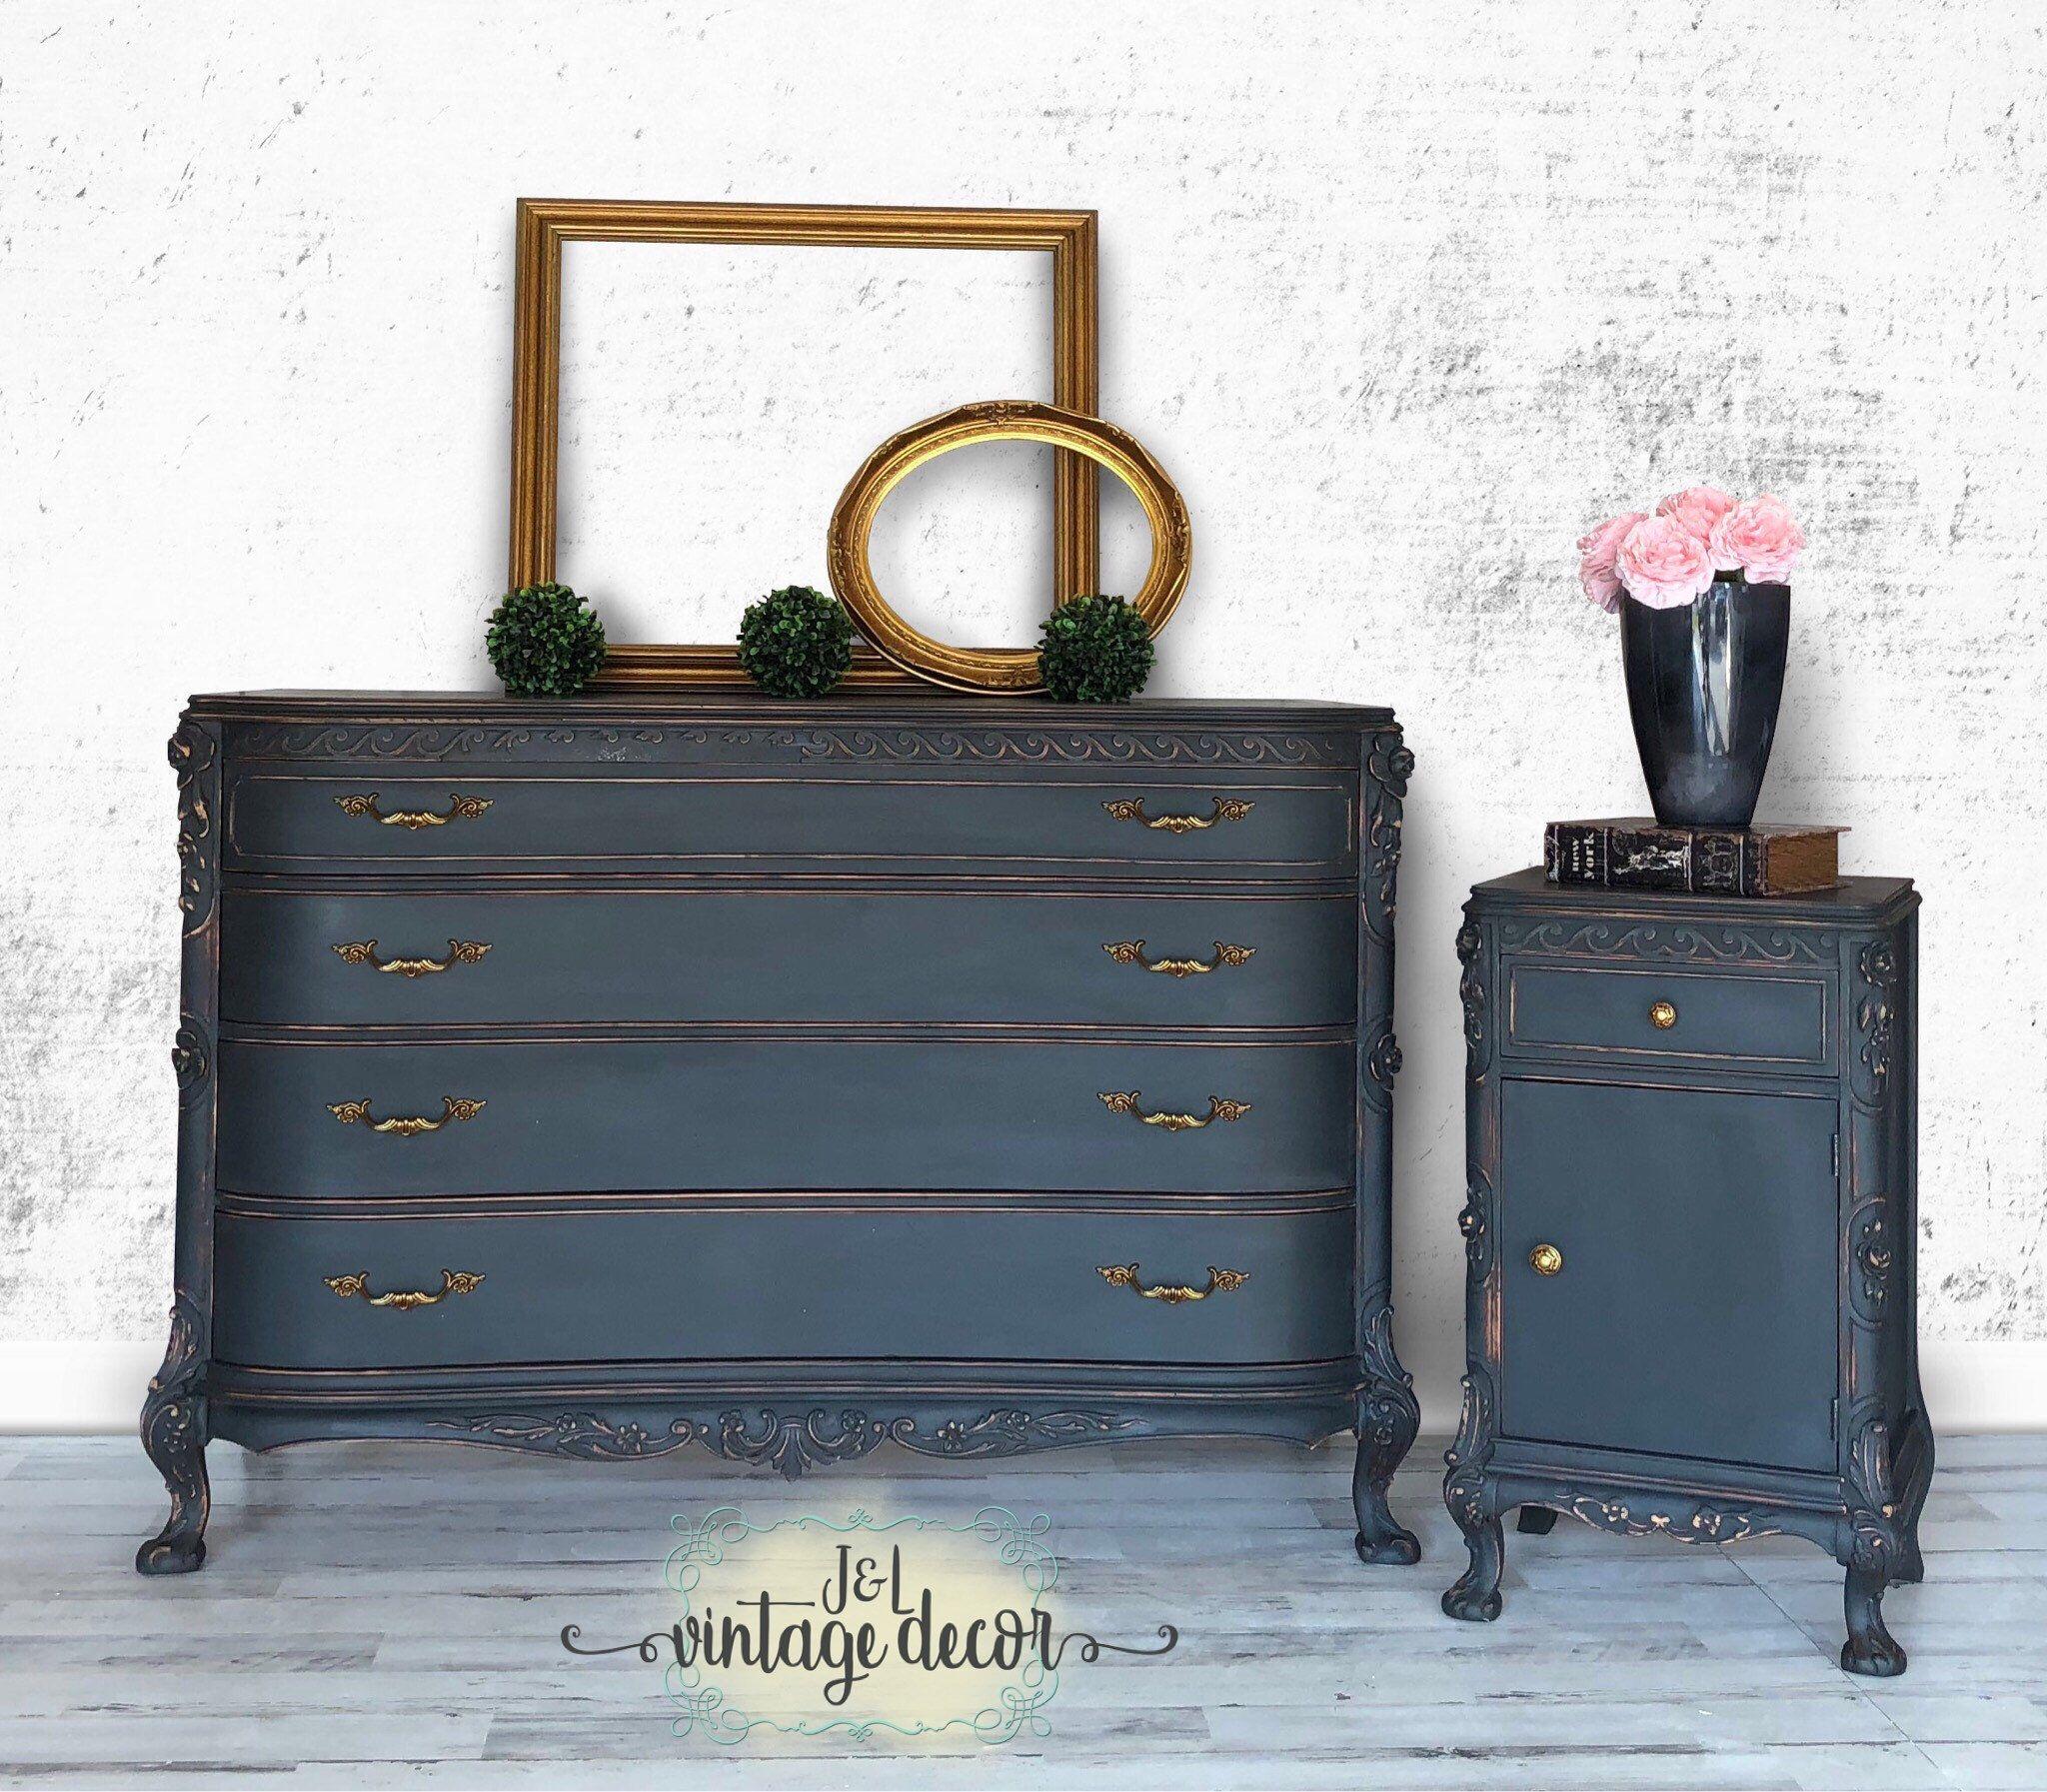 Sold Dresser And Nightstand Set Vintage Bedroom Furniture Hand Painted Bedroom Furniture Makeover Vintage Bedroom Furniture